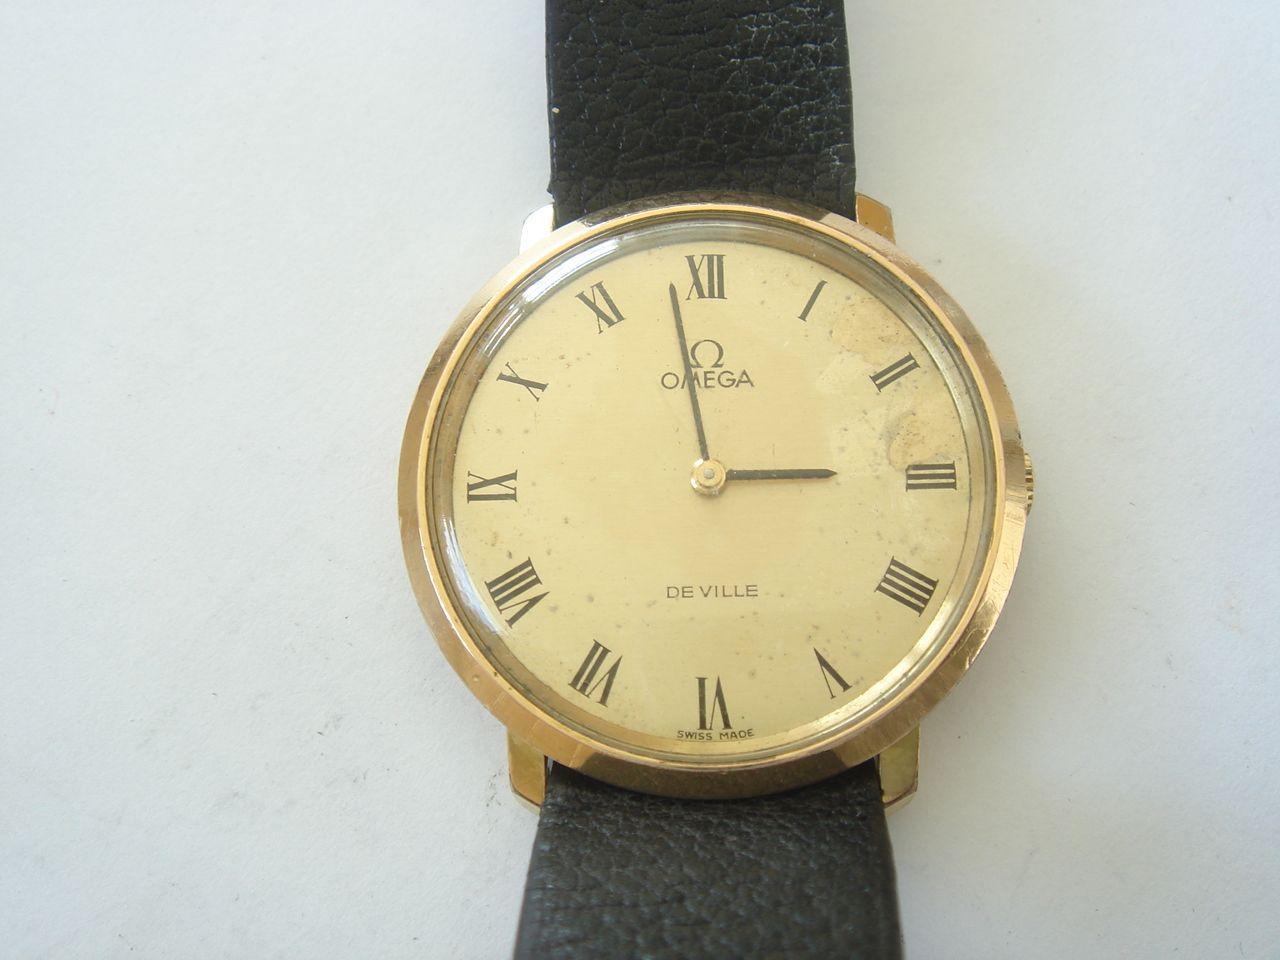 b56b0ed91f70 Omega De Ville Antique Watches « One More Soul